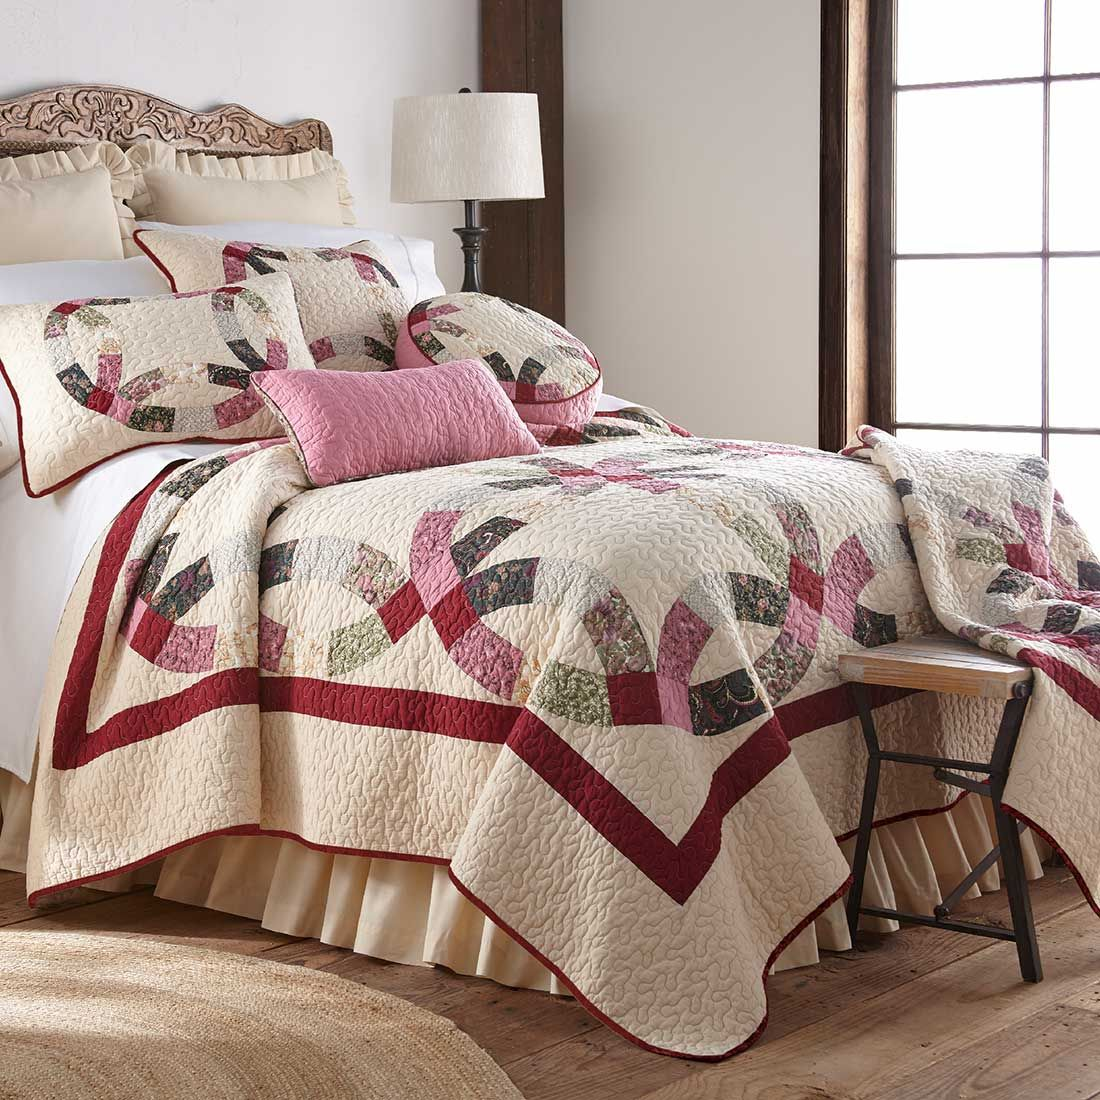 Deidre Wedding Ring Quilt King Cracker Barrel Contemporary Bed Cotton Quilt Set Cool Beds